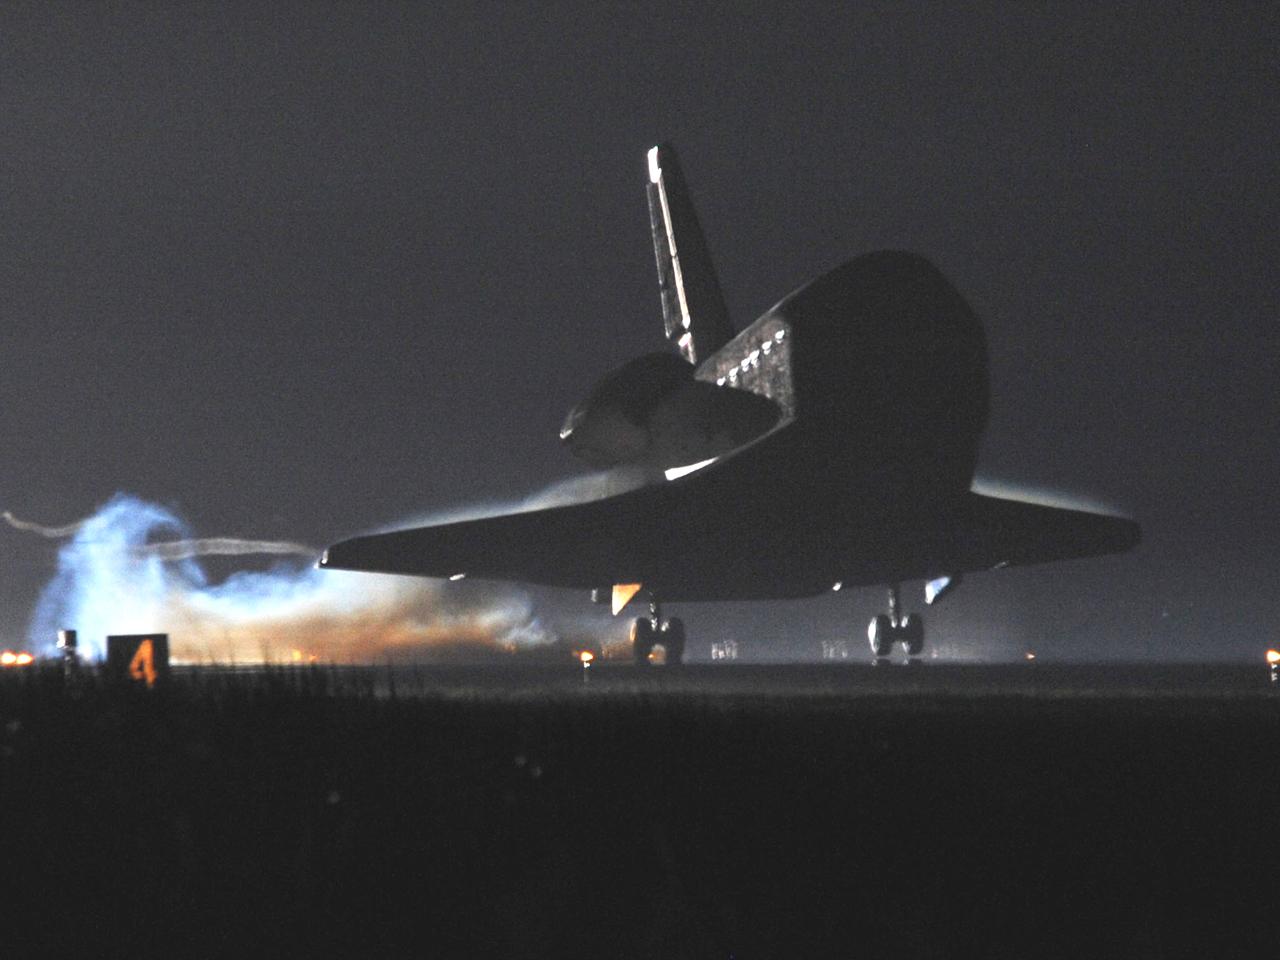 Space shuttle sonic boom helps foil car theft - CBS News